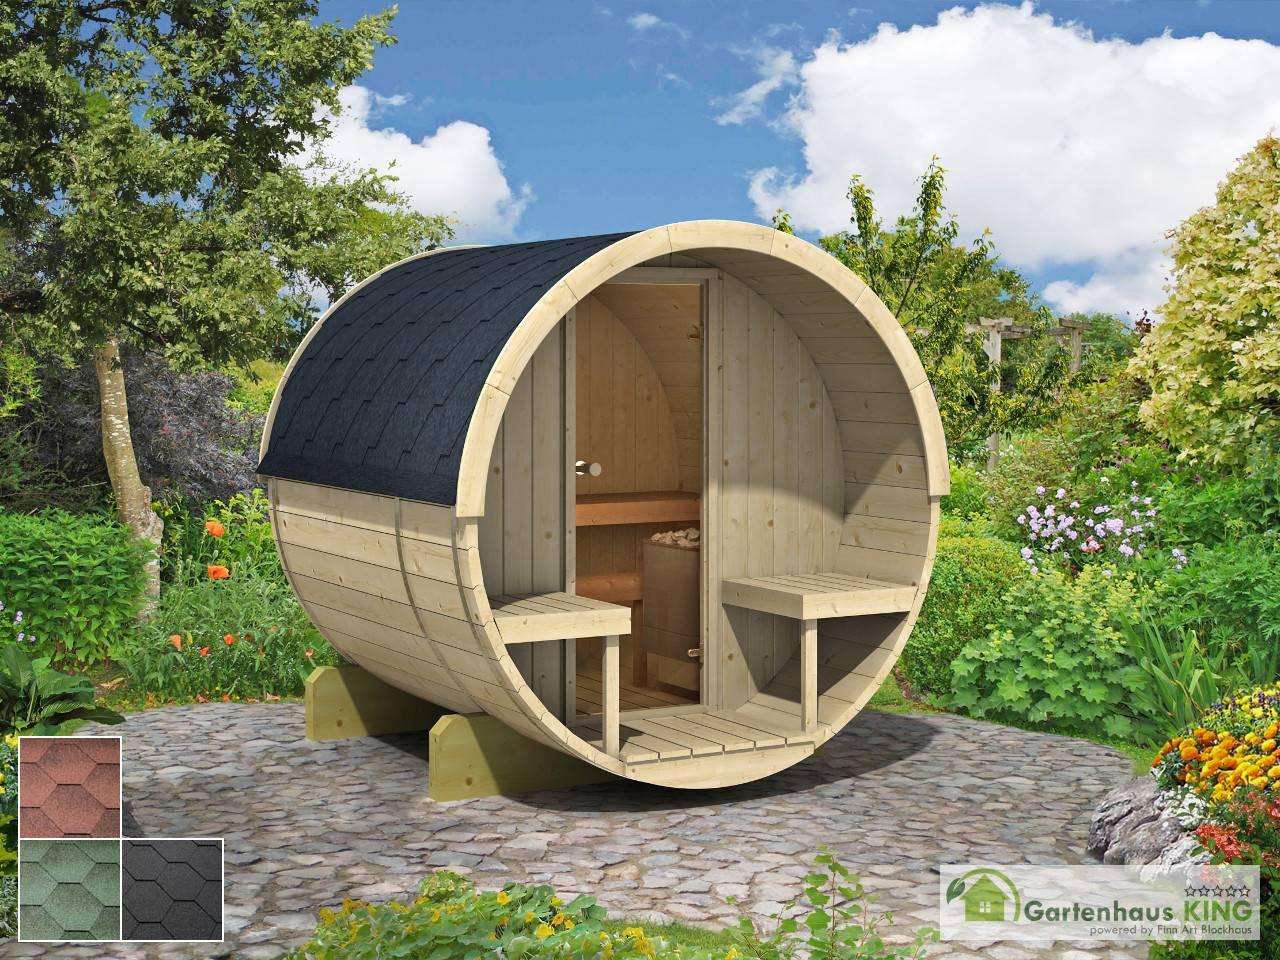 fasssauna selber bauen designe deko gartensauna selbst bauen schone design ideen fasssauna. Black Bedroom Furniture Sets. Home Design Ideas